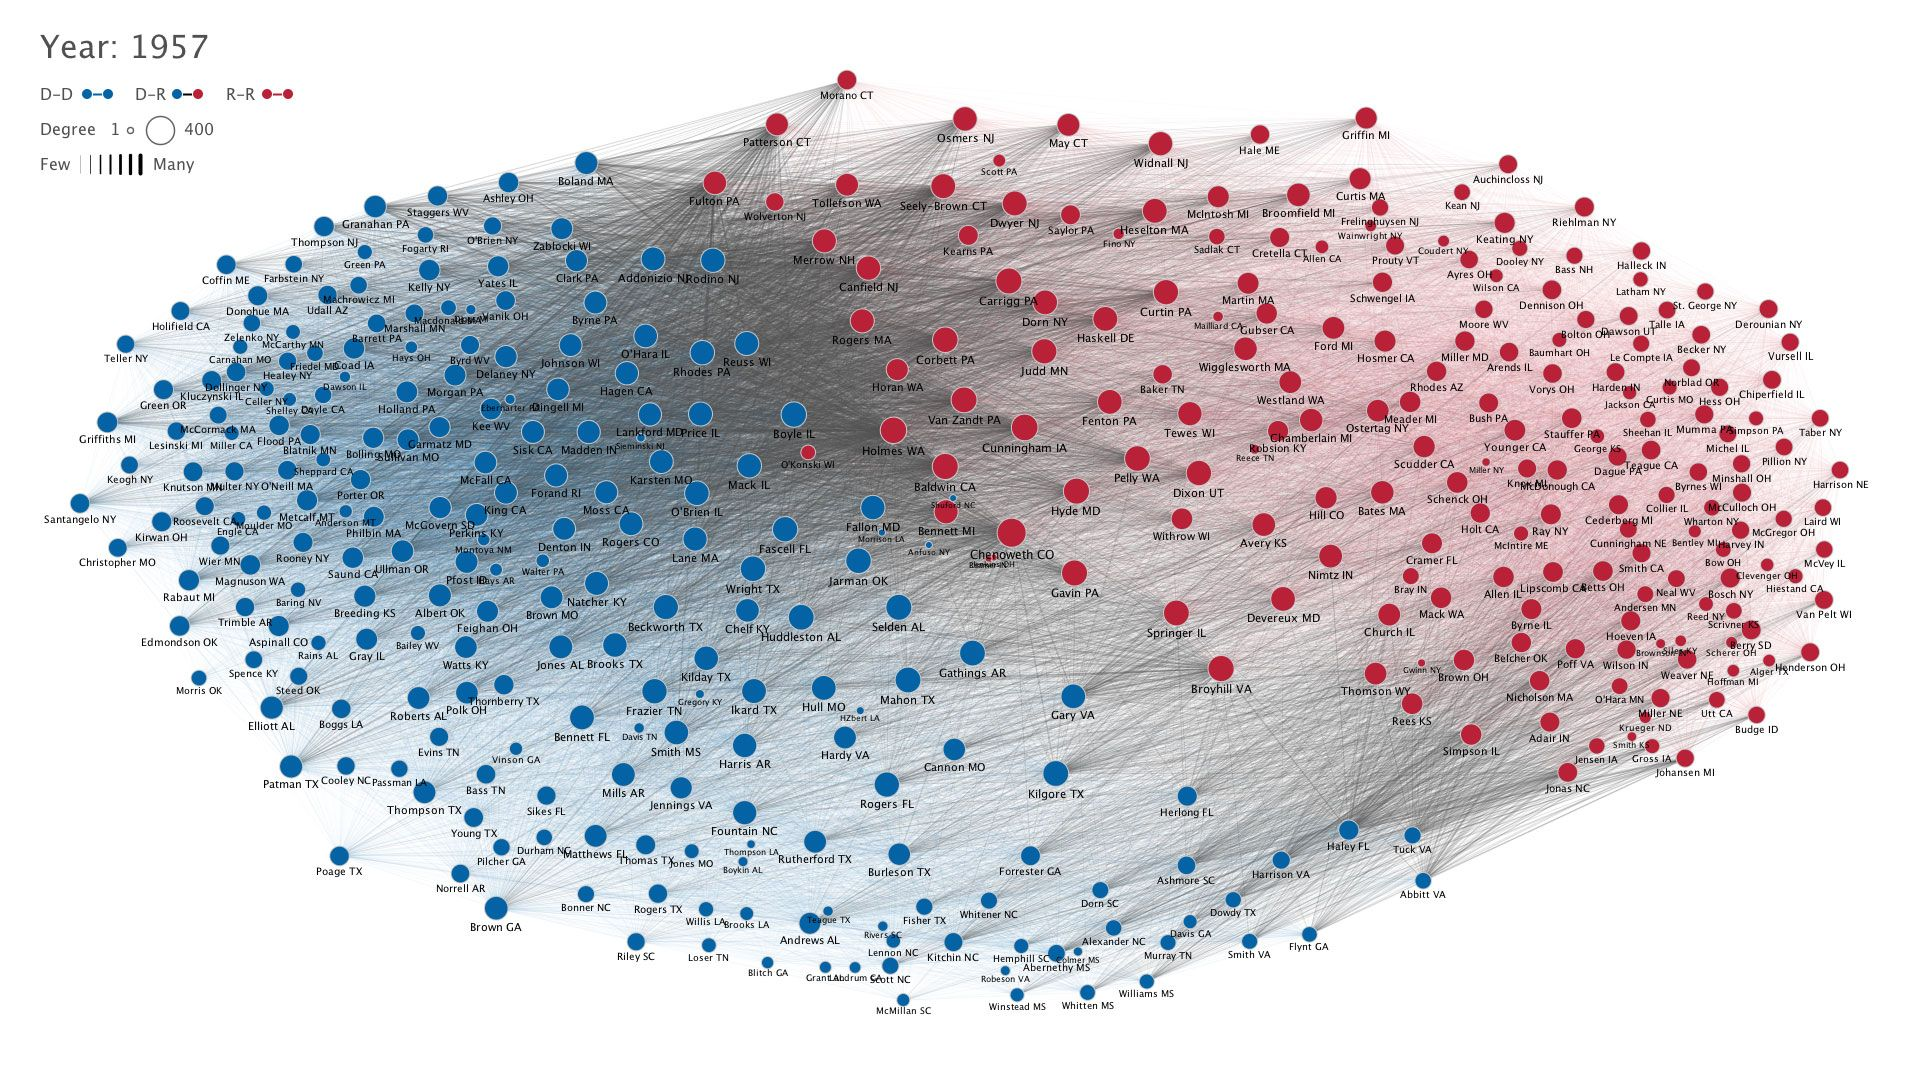 Political Network